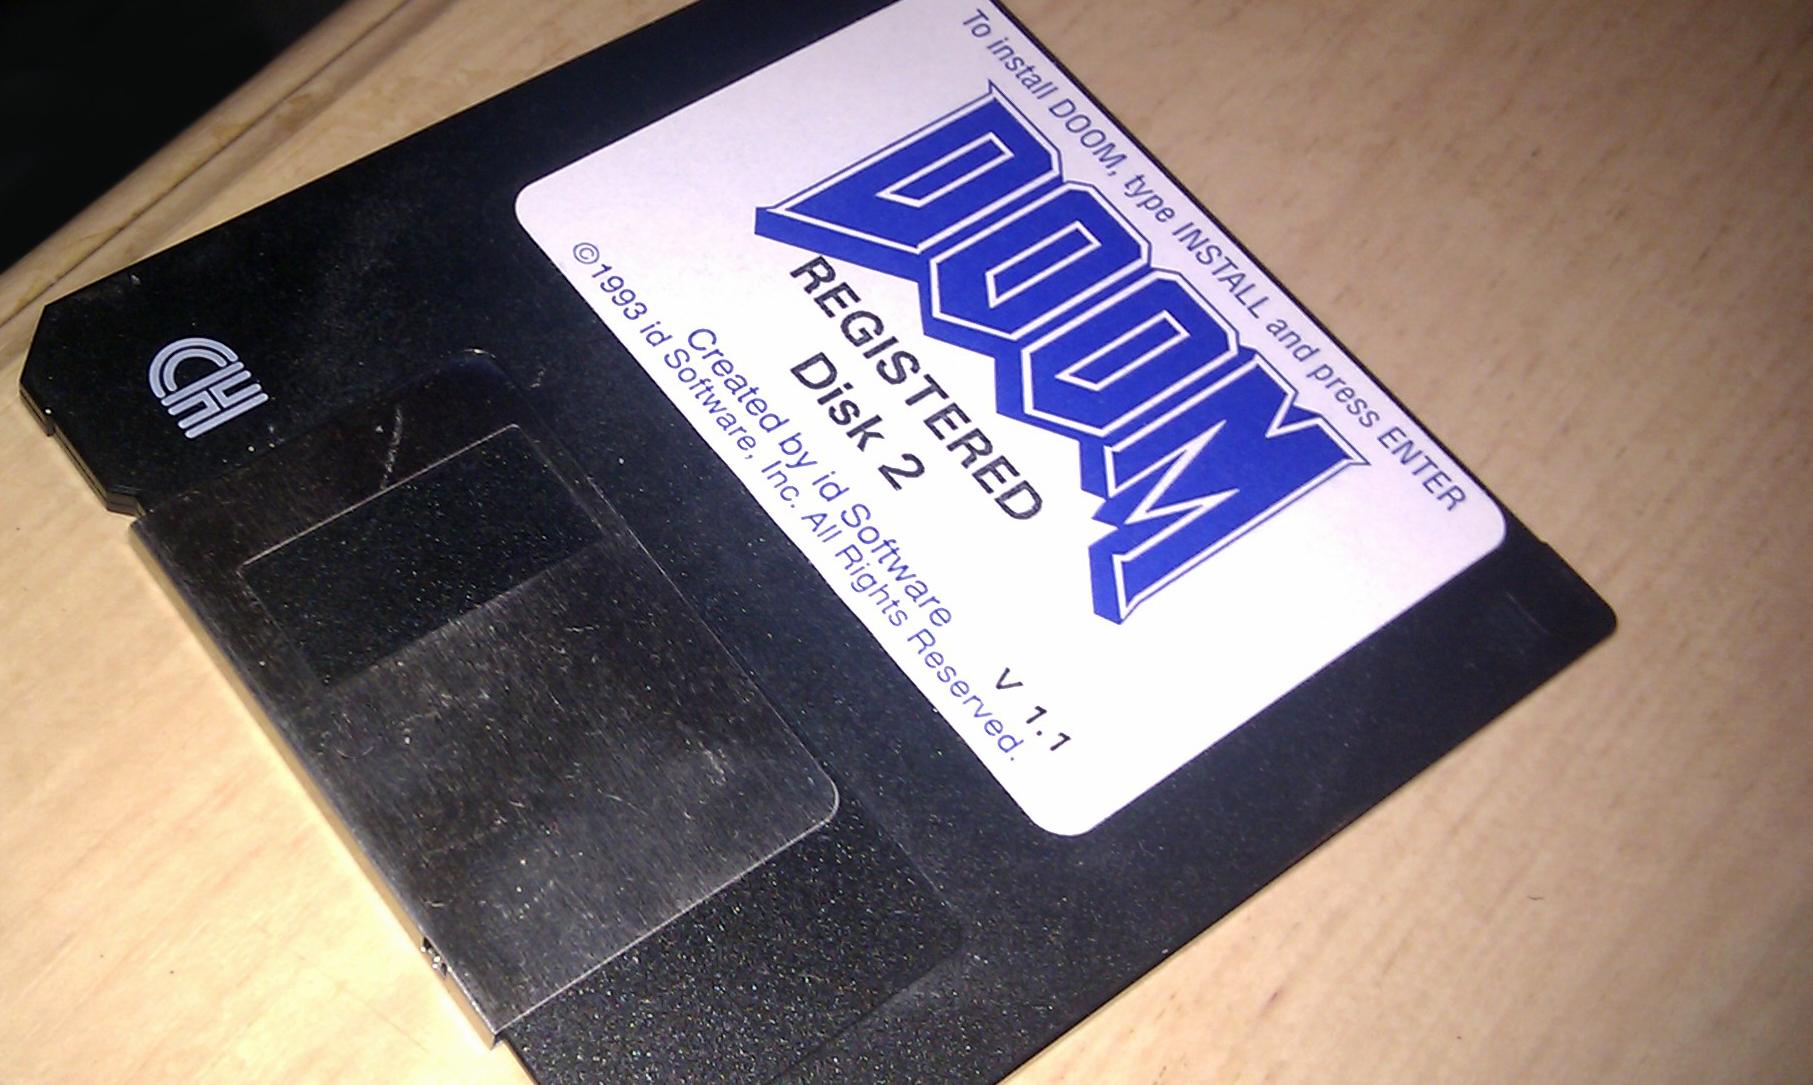 Classic Doom instillation floppy disk